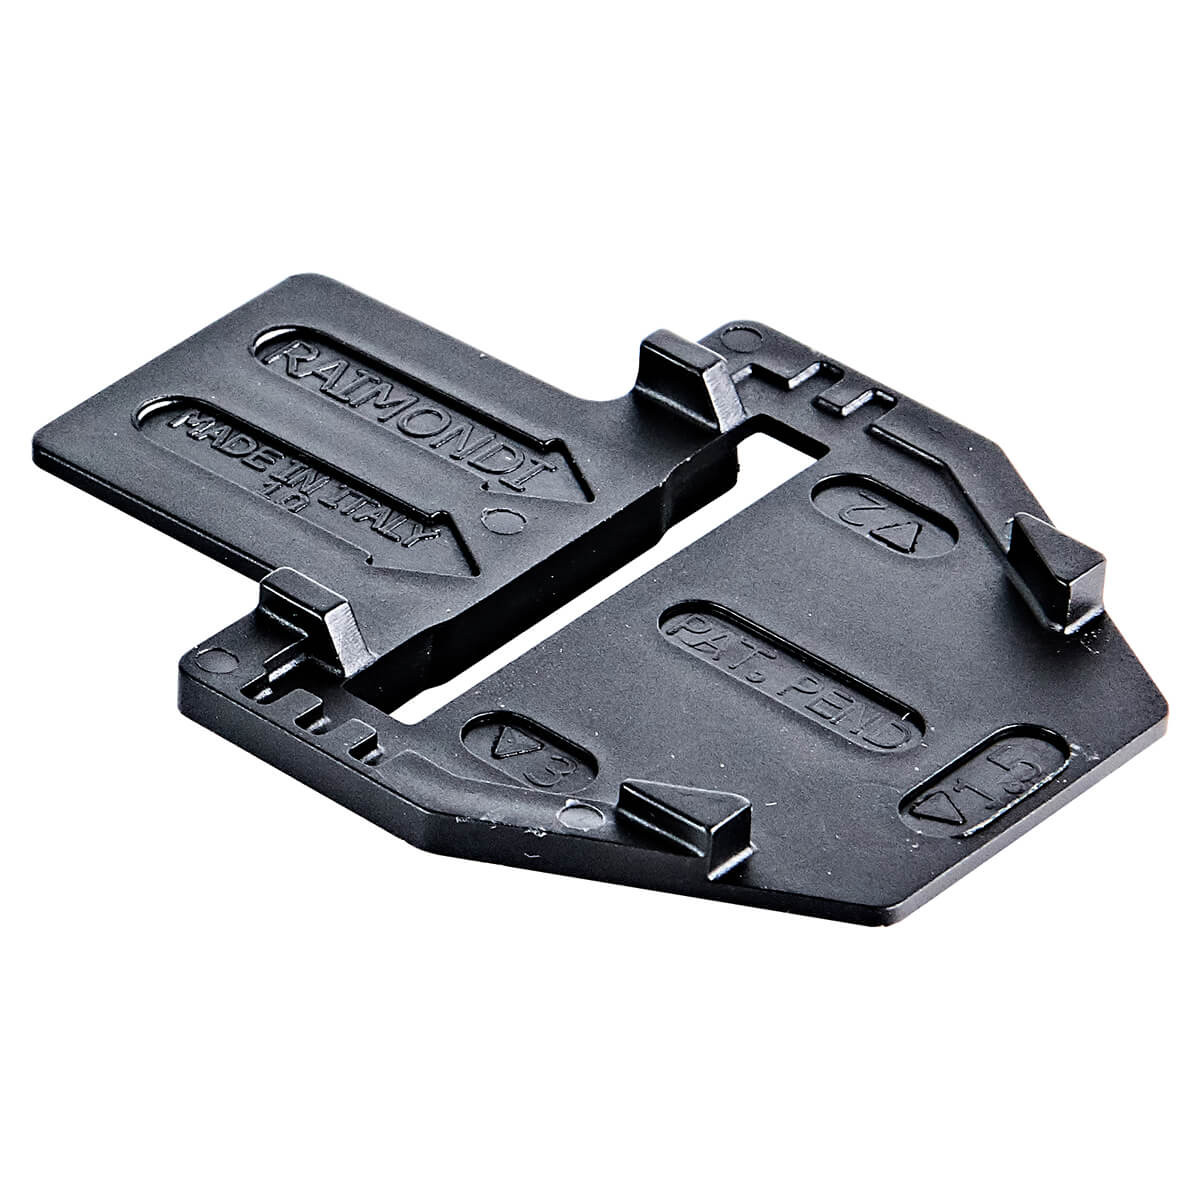 Raimondi Tile Protecting Platform and Multi-Size Spacer